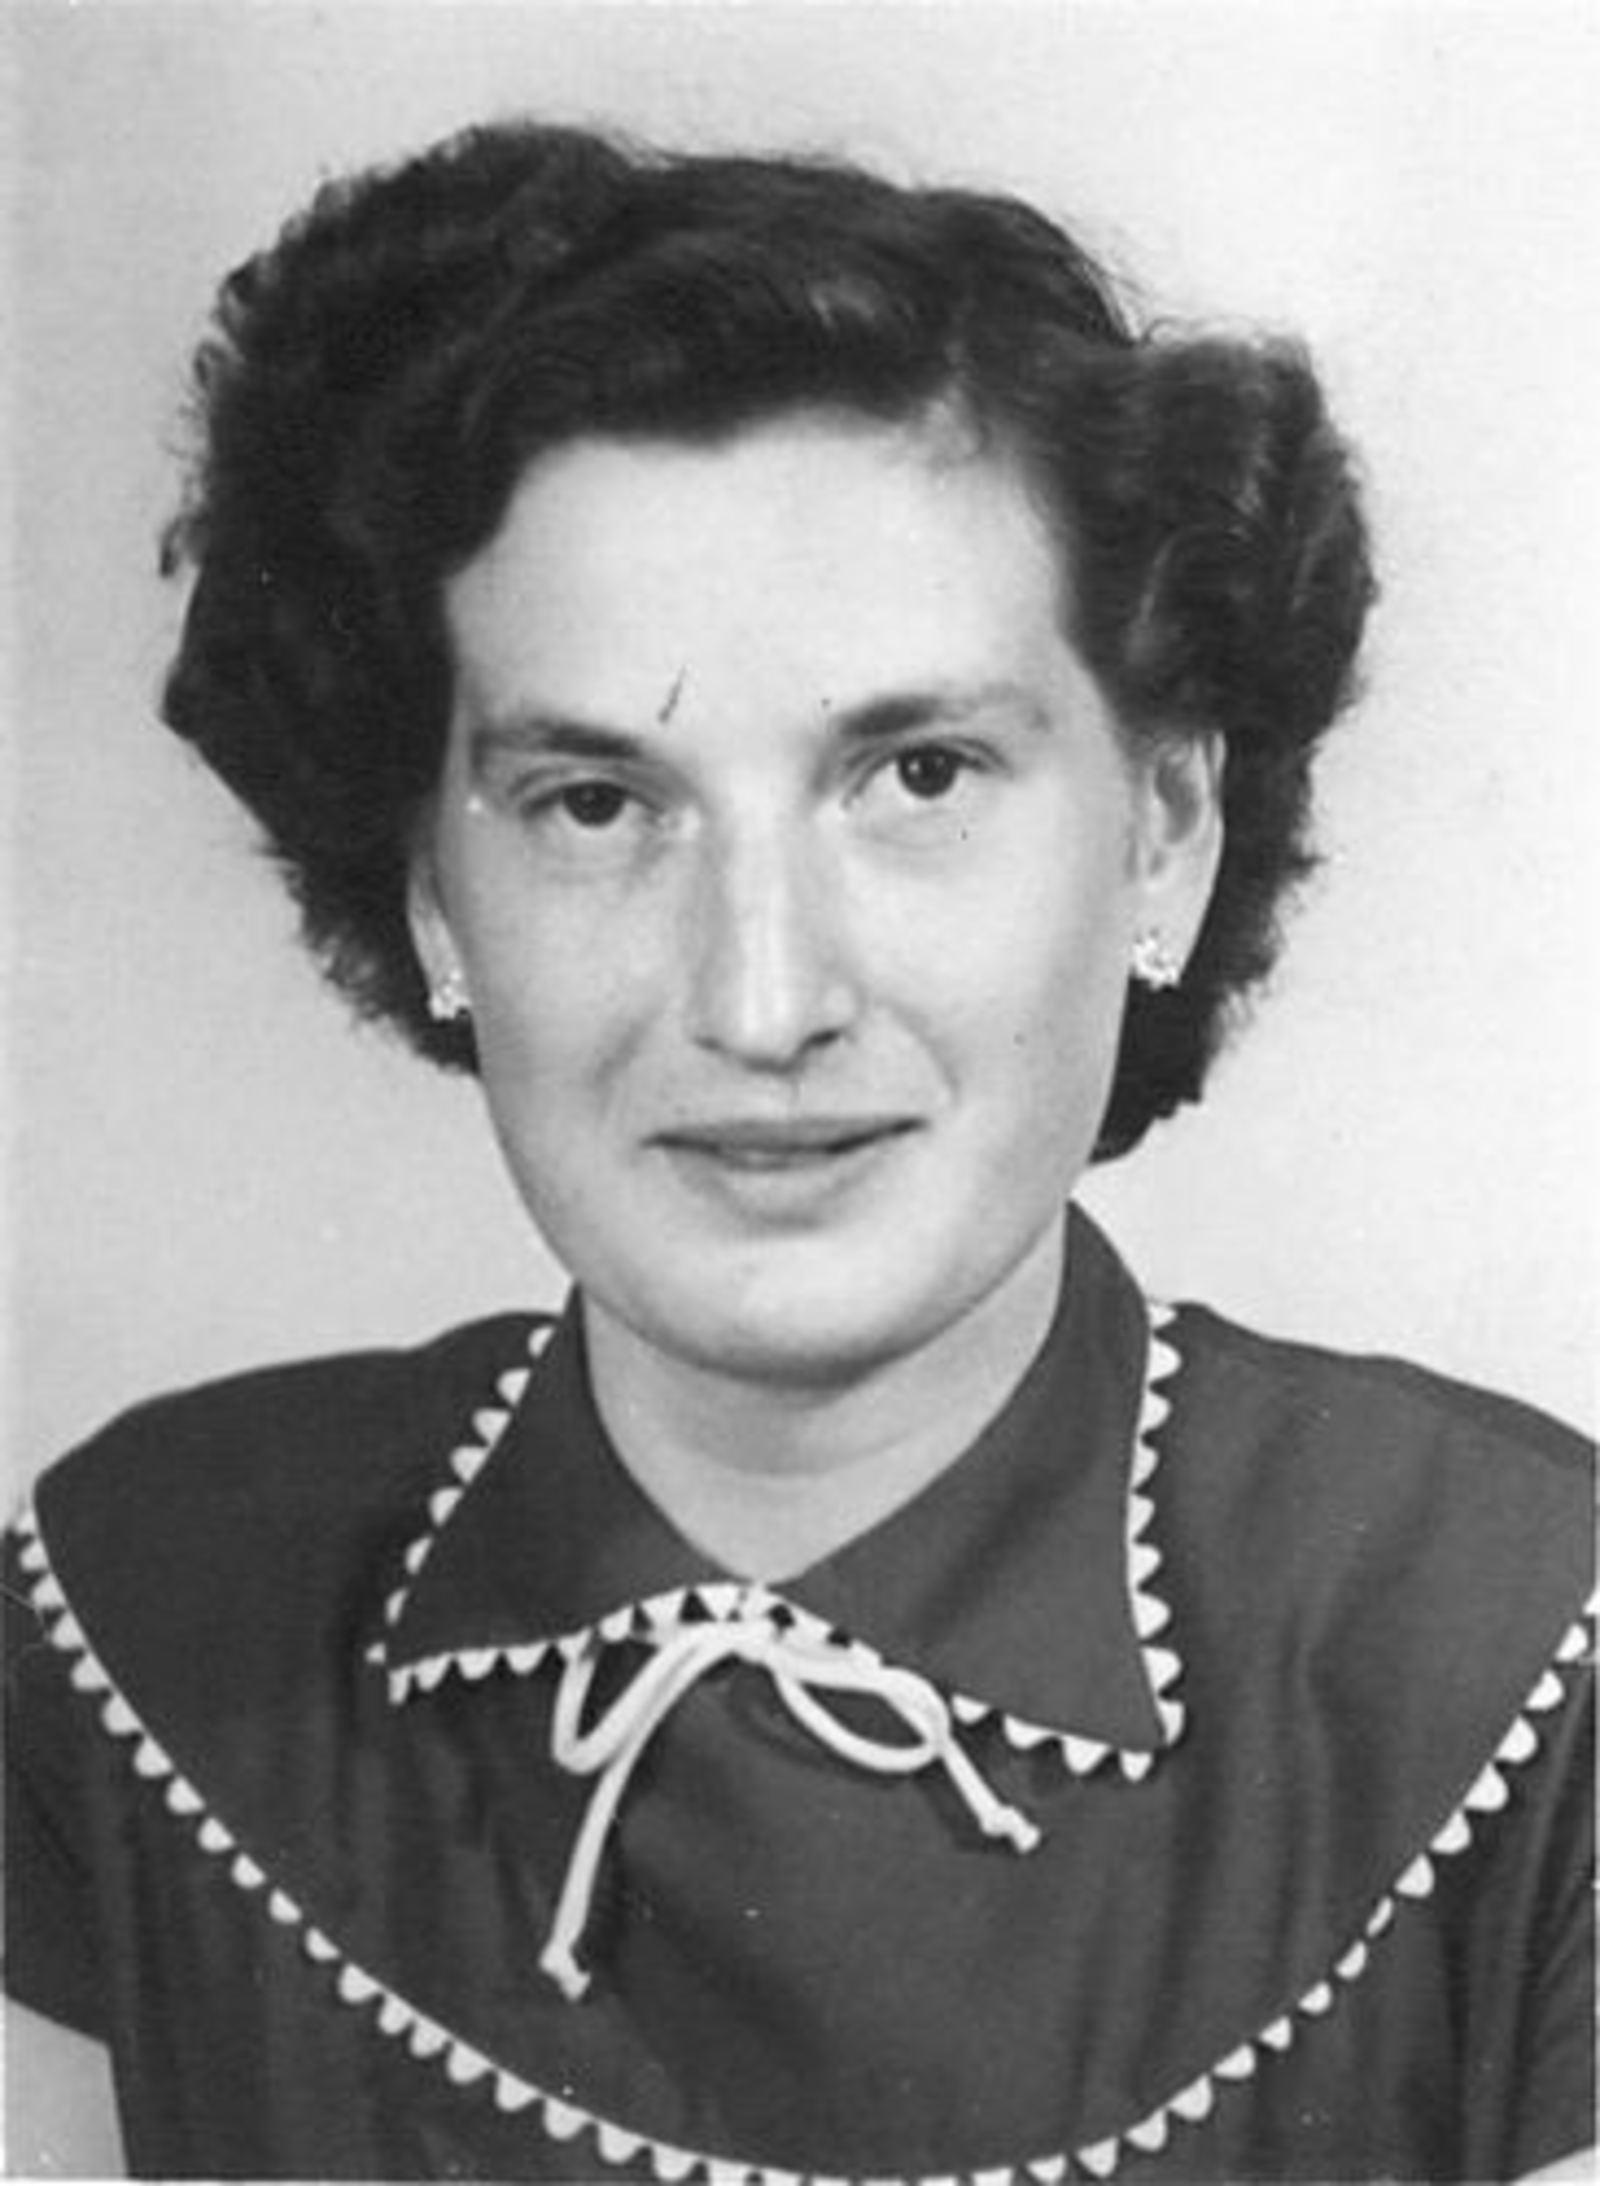 Dam Johanna M 1935 19__ Portret 01